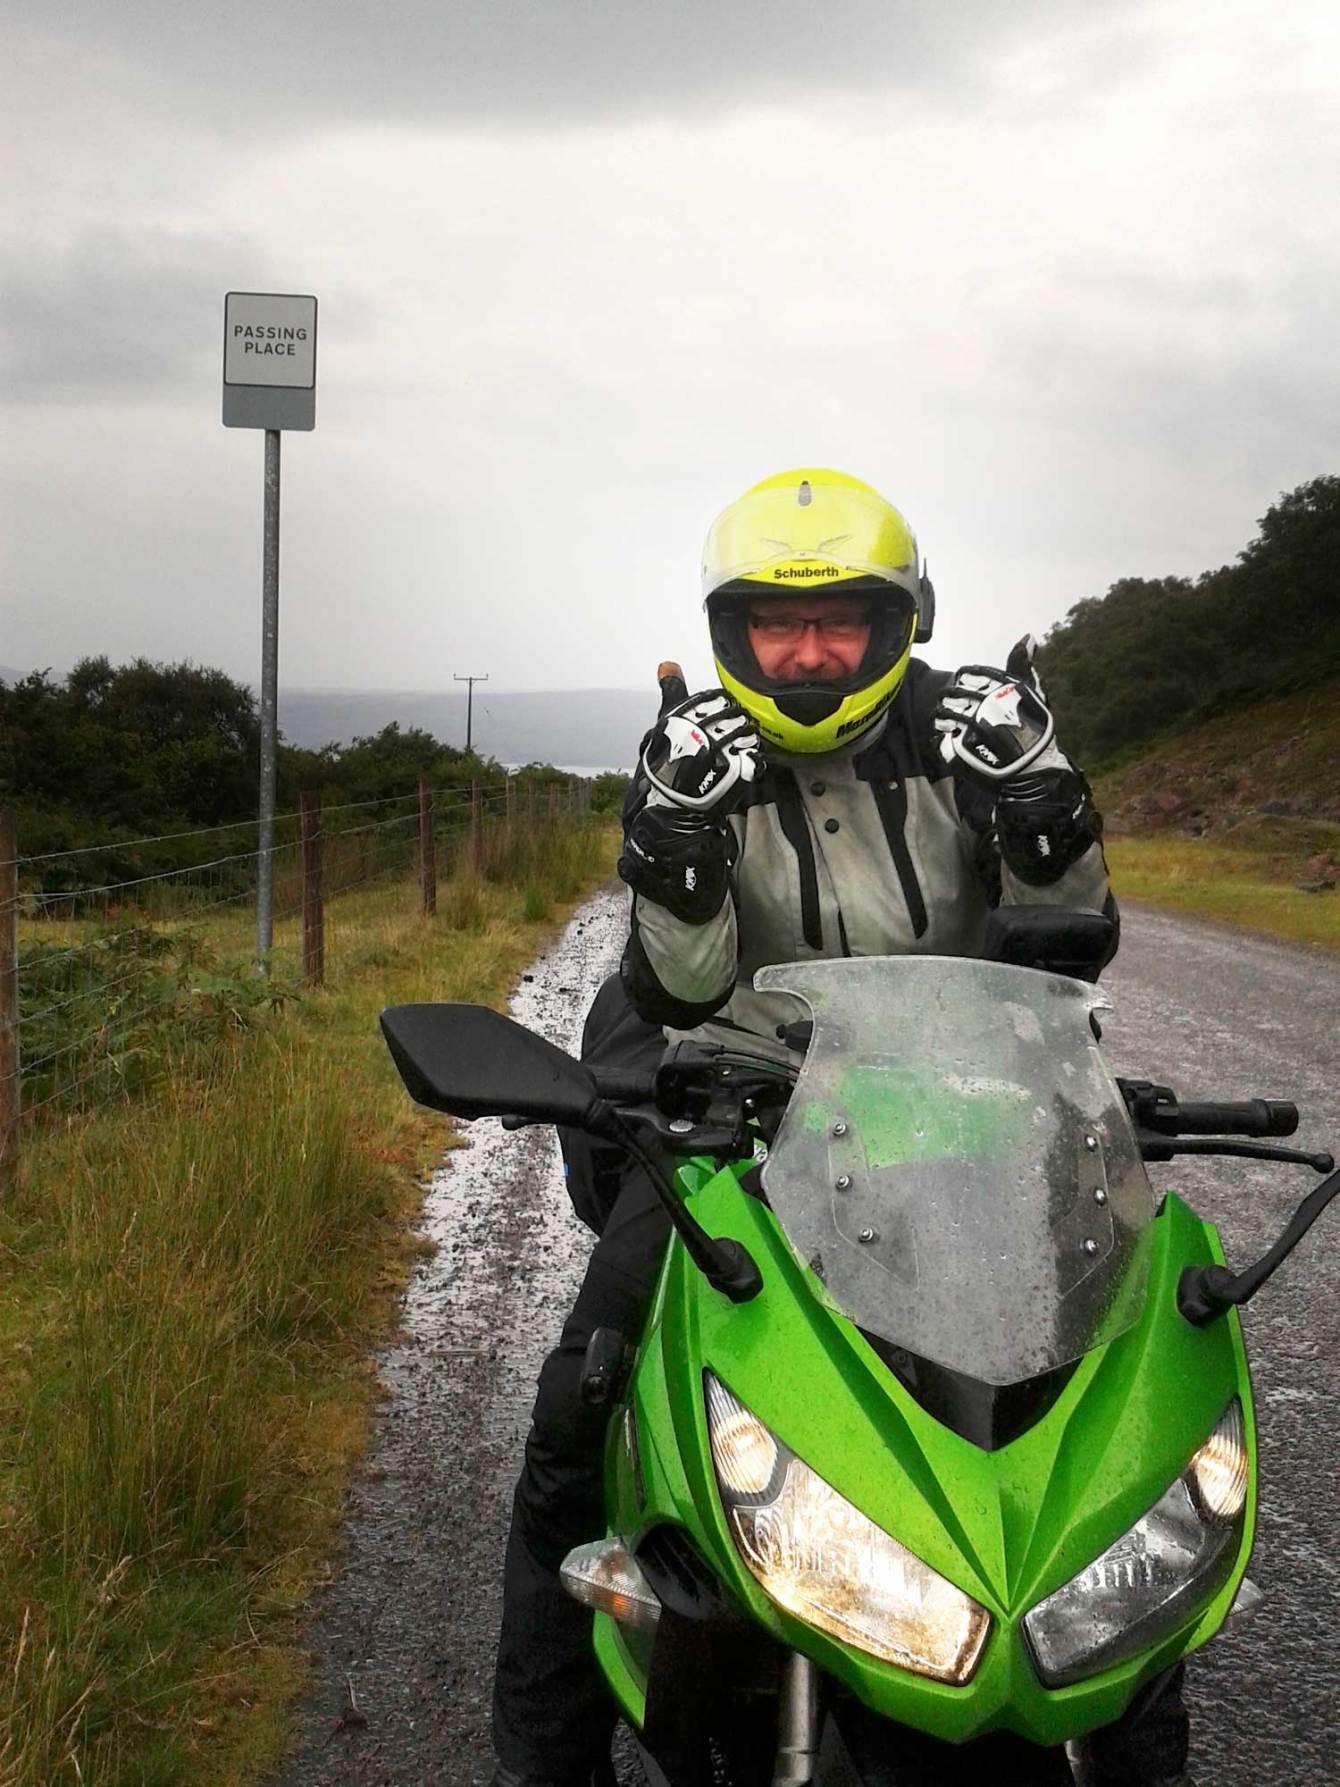 Despite the rain, Applecross was an amazing ride